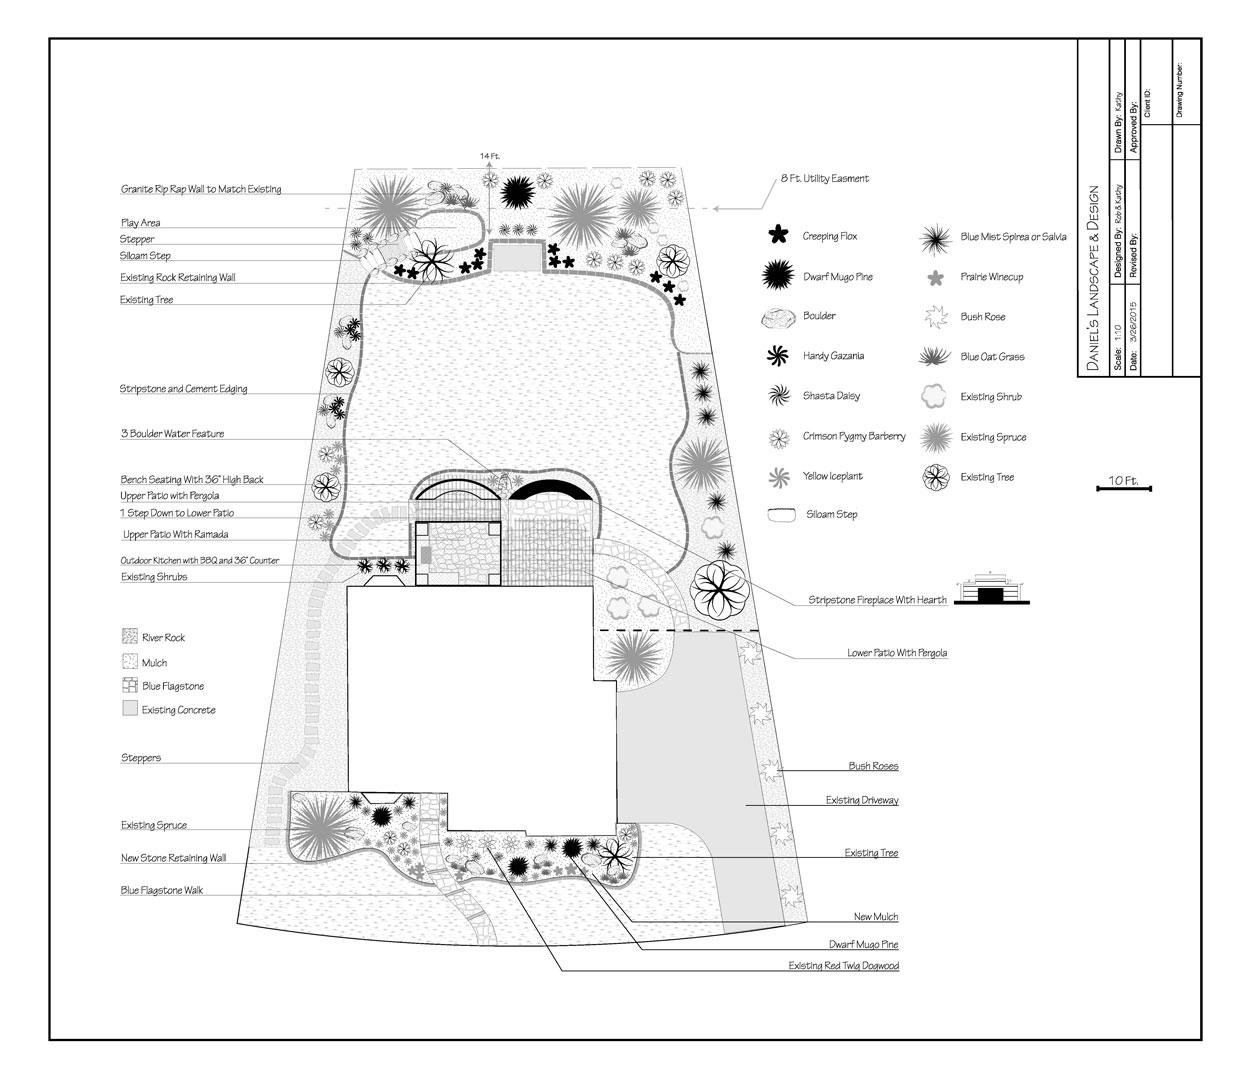 Daniel's Landscape & Design LLC